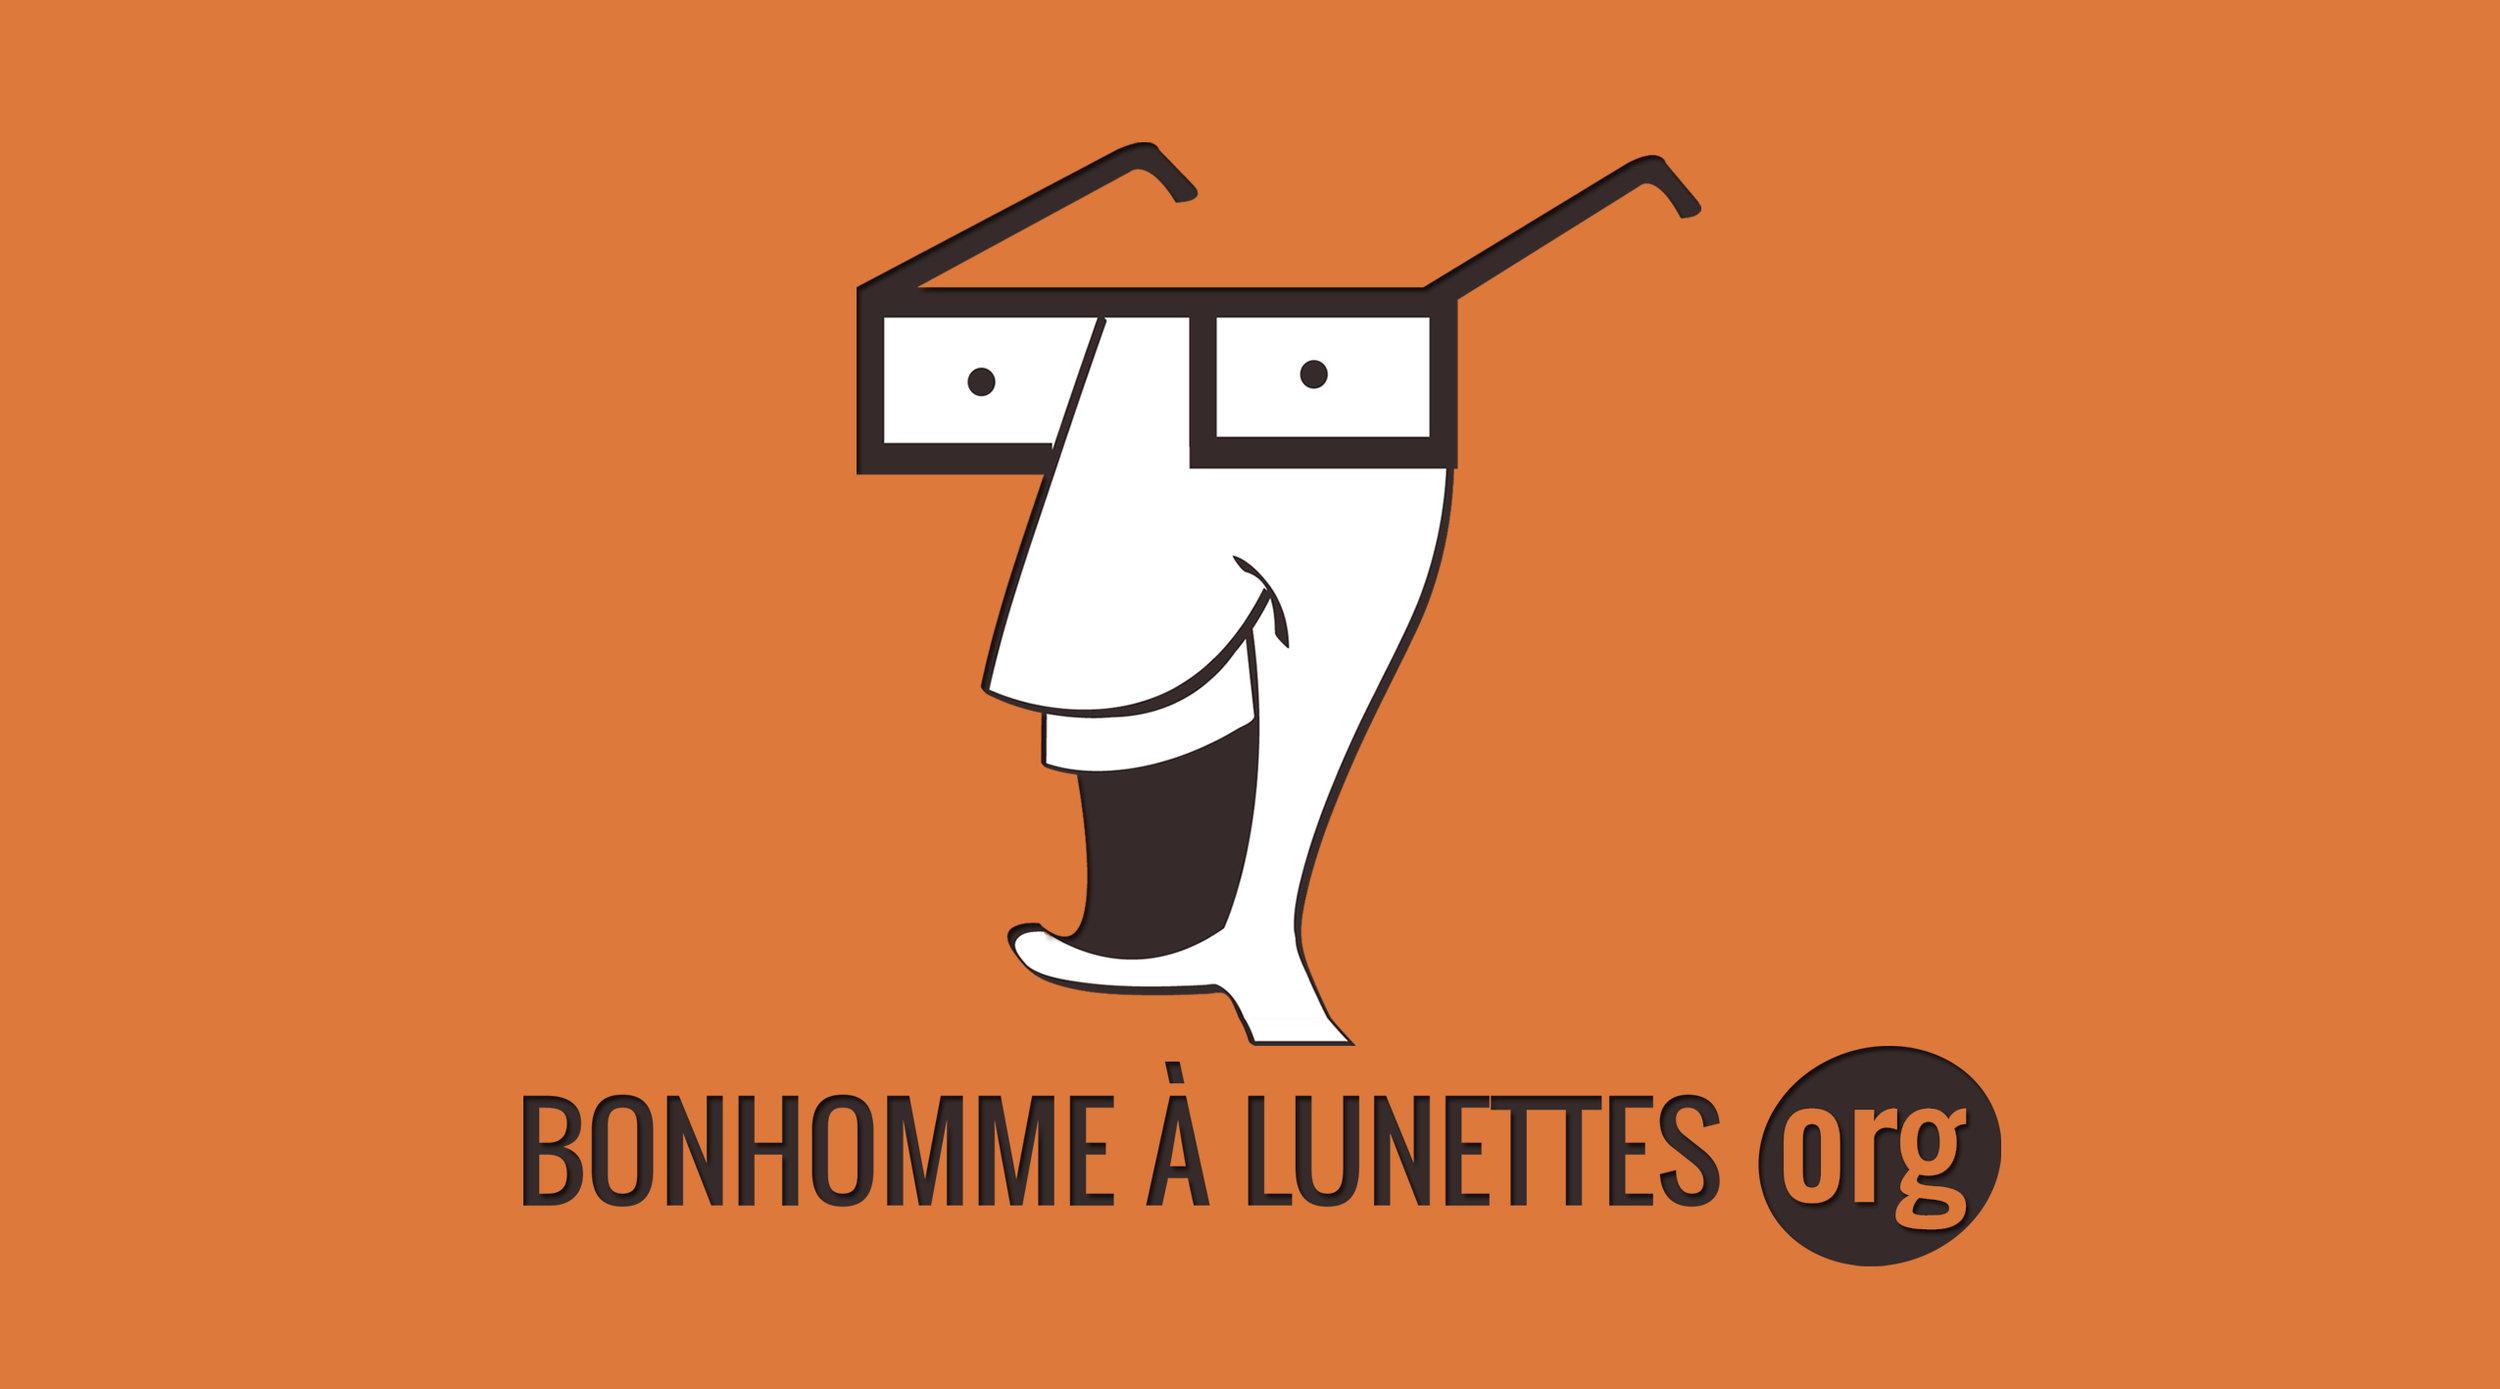 logo-bonhomme-a-lunettes-medias.jpg